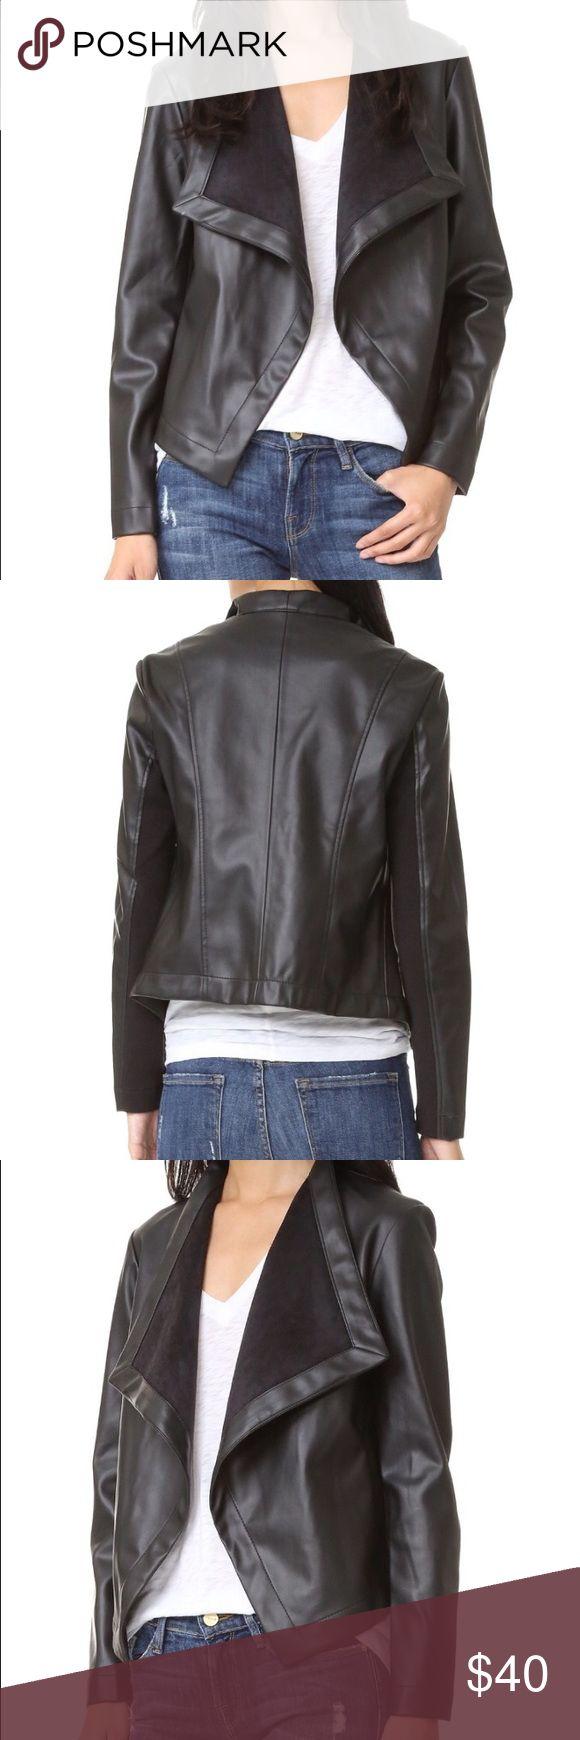 BB Dakota Peppin Vegan Leather Drapey Jacket Excellent condition. Smooth black vegan leather jacket. Ribbed sleeve panels. Oversized lapels. BB Dakota Jackets & Coats